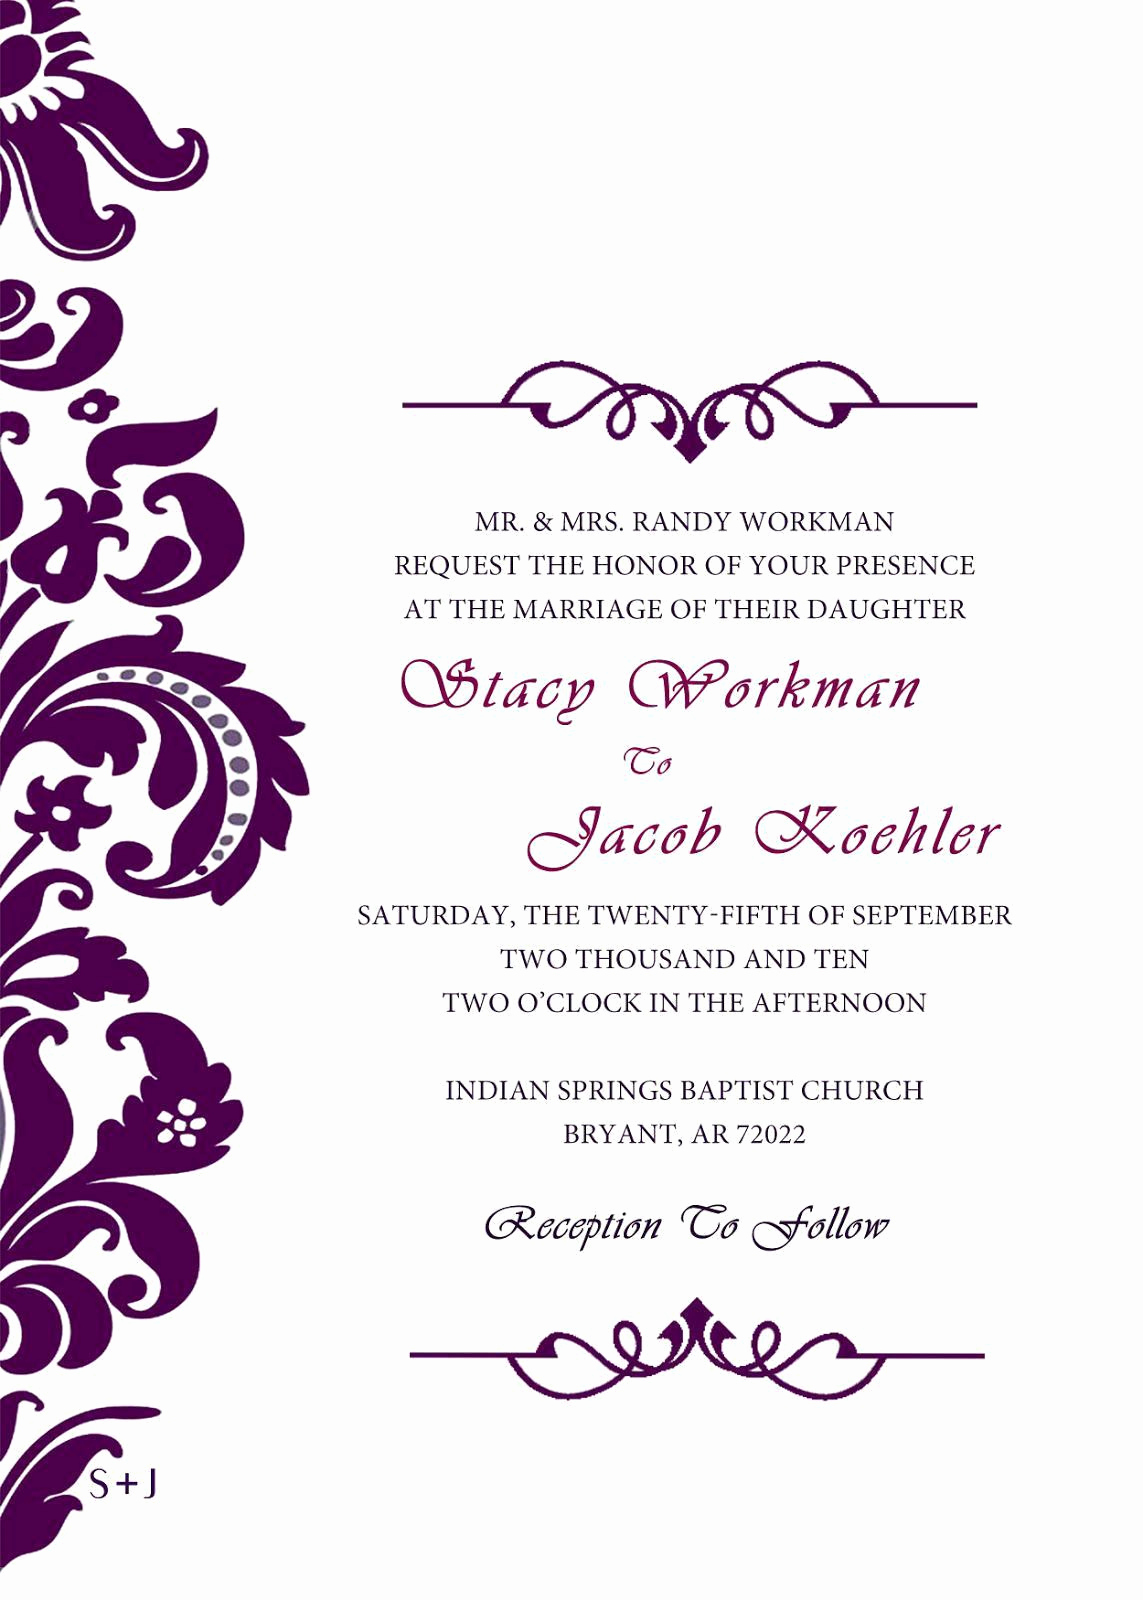 Blank Wedding Invitation Templates Awesome Best Invitation Cards Unique Wedding Invitation Card